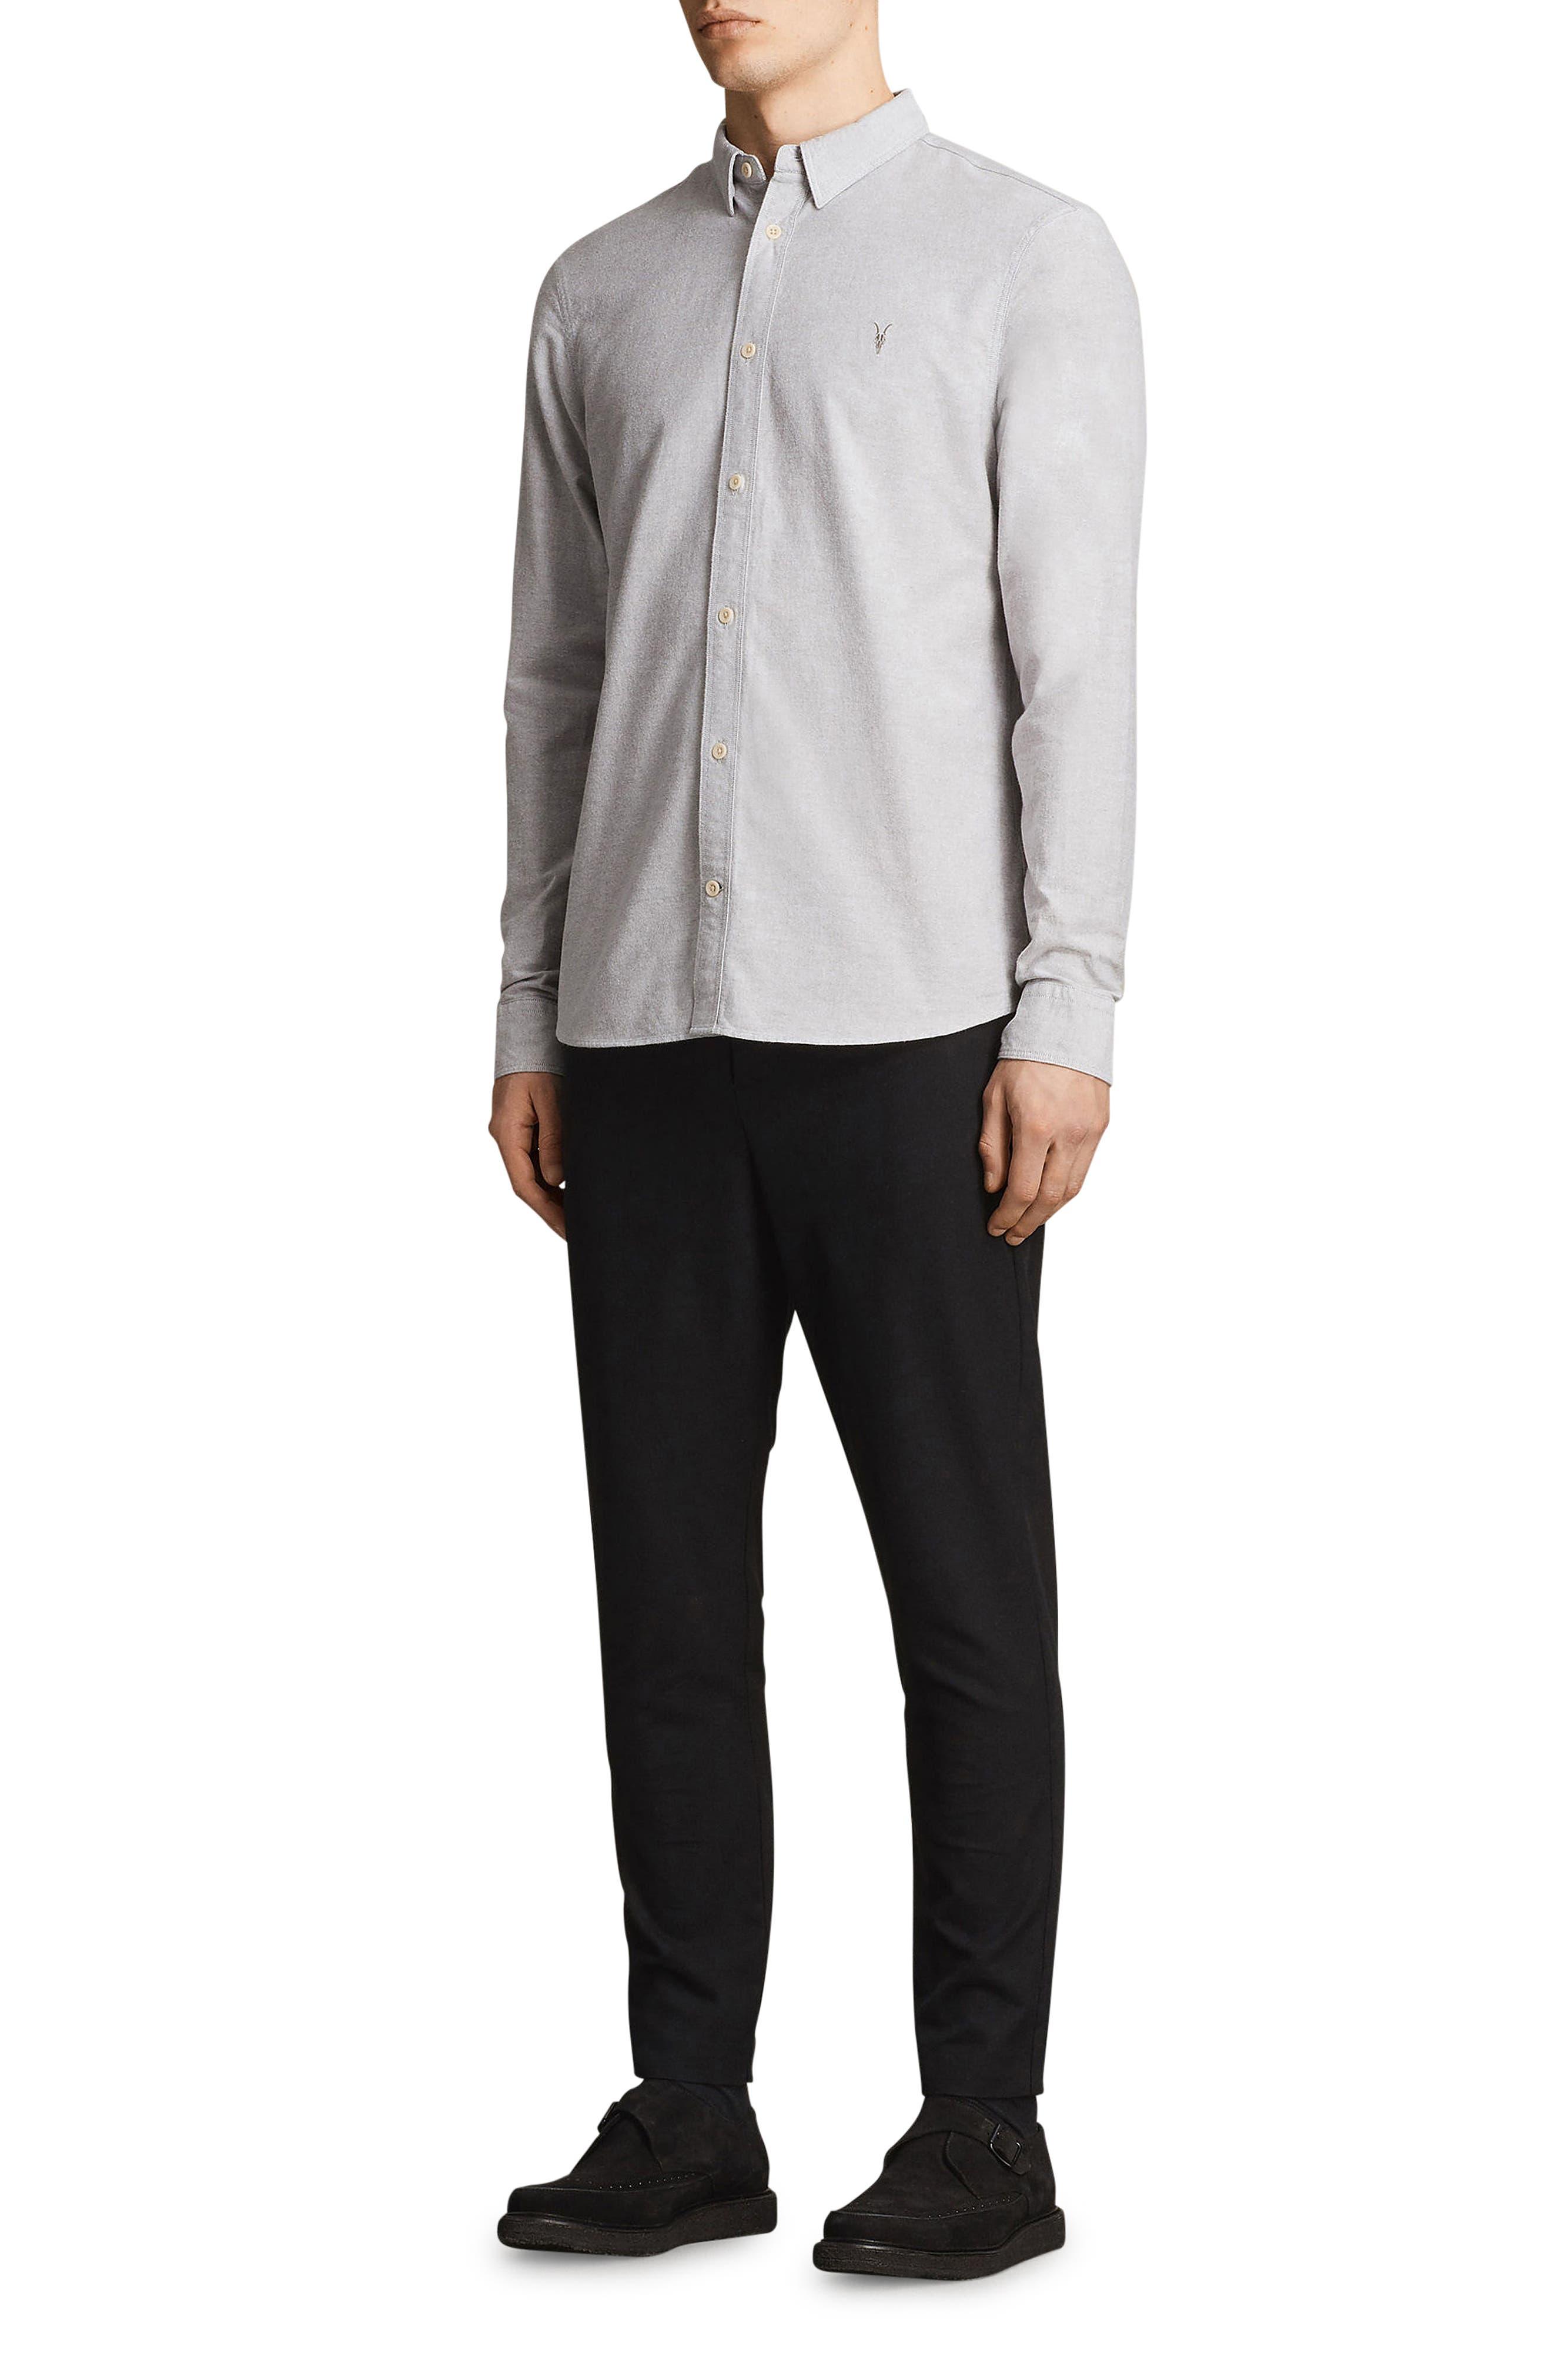 Huntington Regular Fit Sport Shirt,                             Alternate thumbnail 4, color,                             DARK GULL GREY